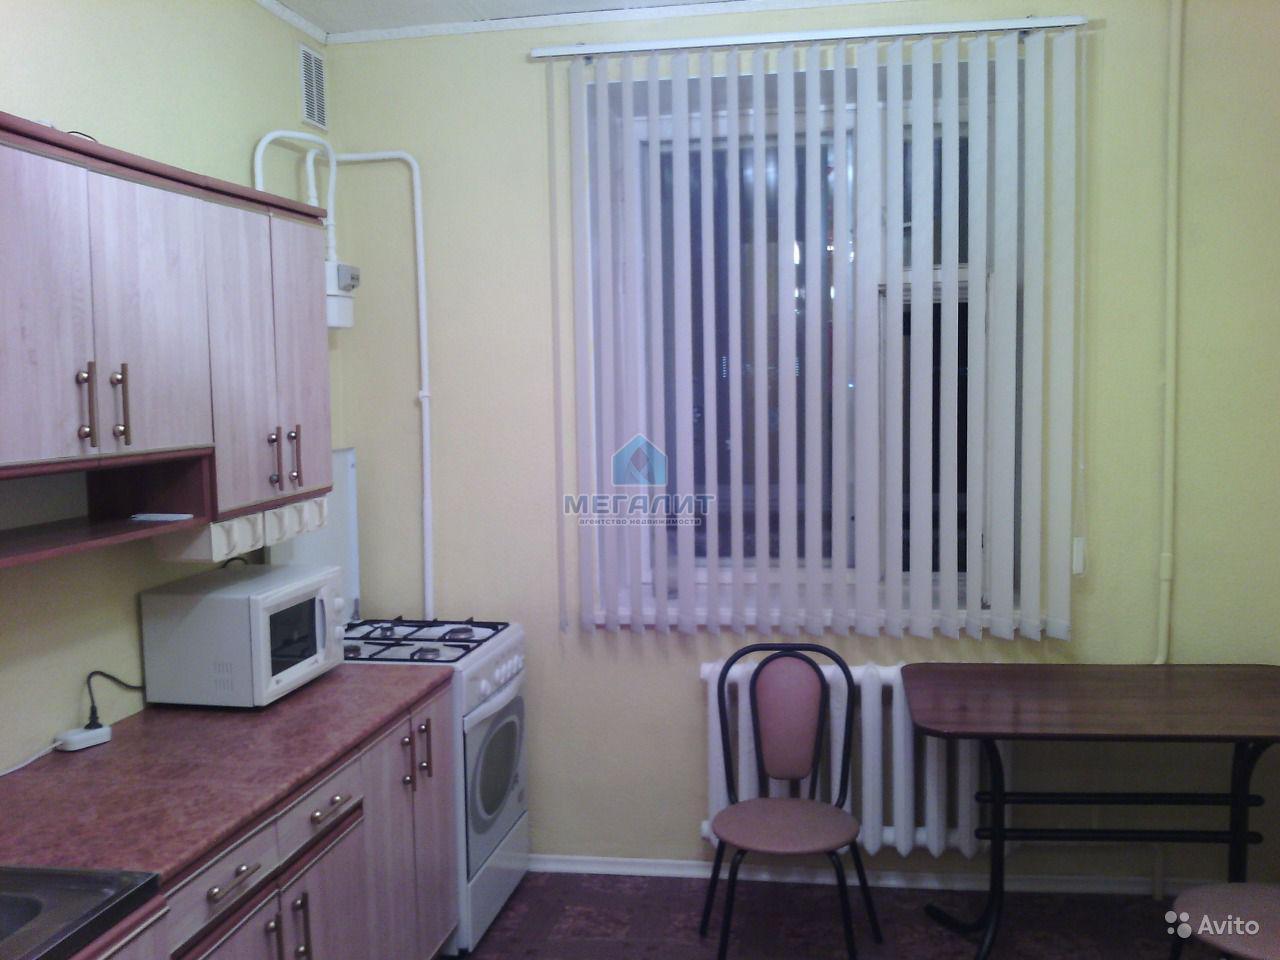 Аренда 1-к квартиры Братьев Касимовых 6А, 45.0 м² (миниатюра №2)